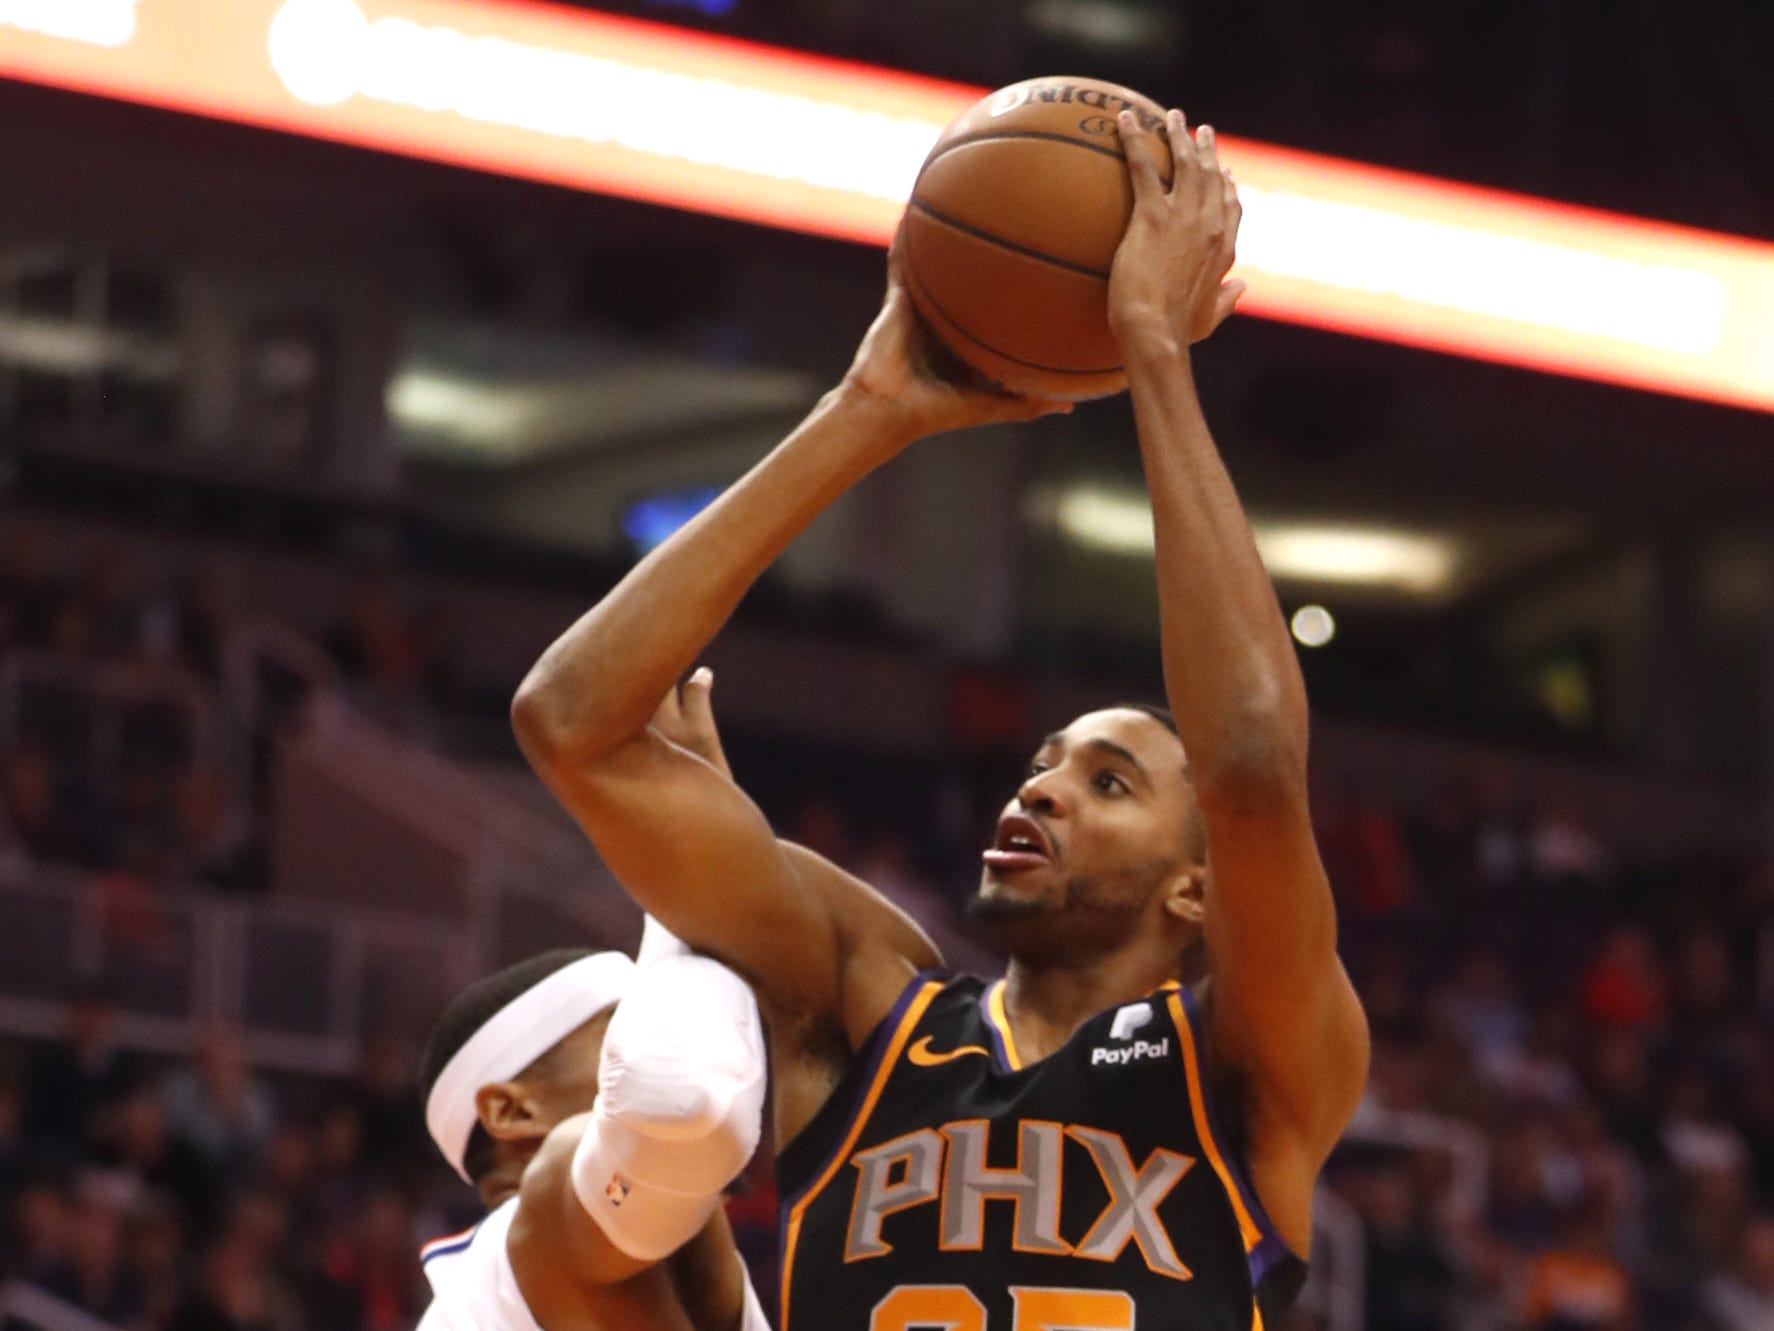 Suns' Mikal Bridges (25) shoots againstduring the first half at Talking Stick Resort Arena in Phoenix, Ariz. on January 4, 2019.